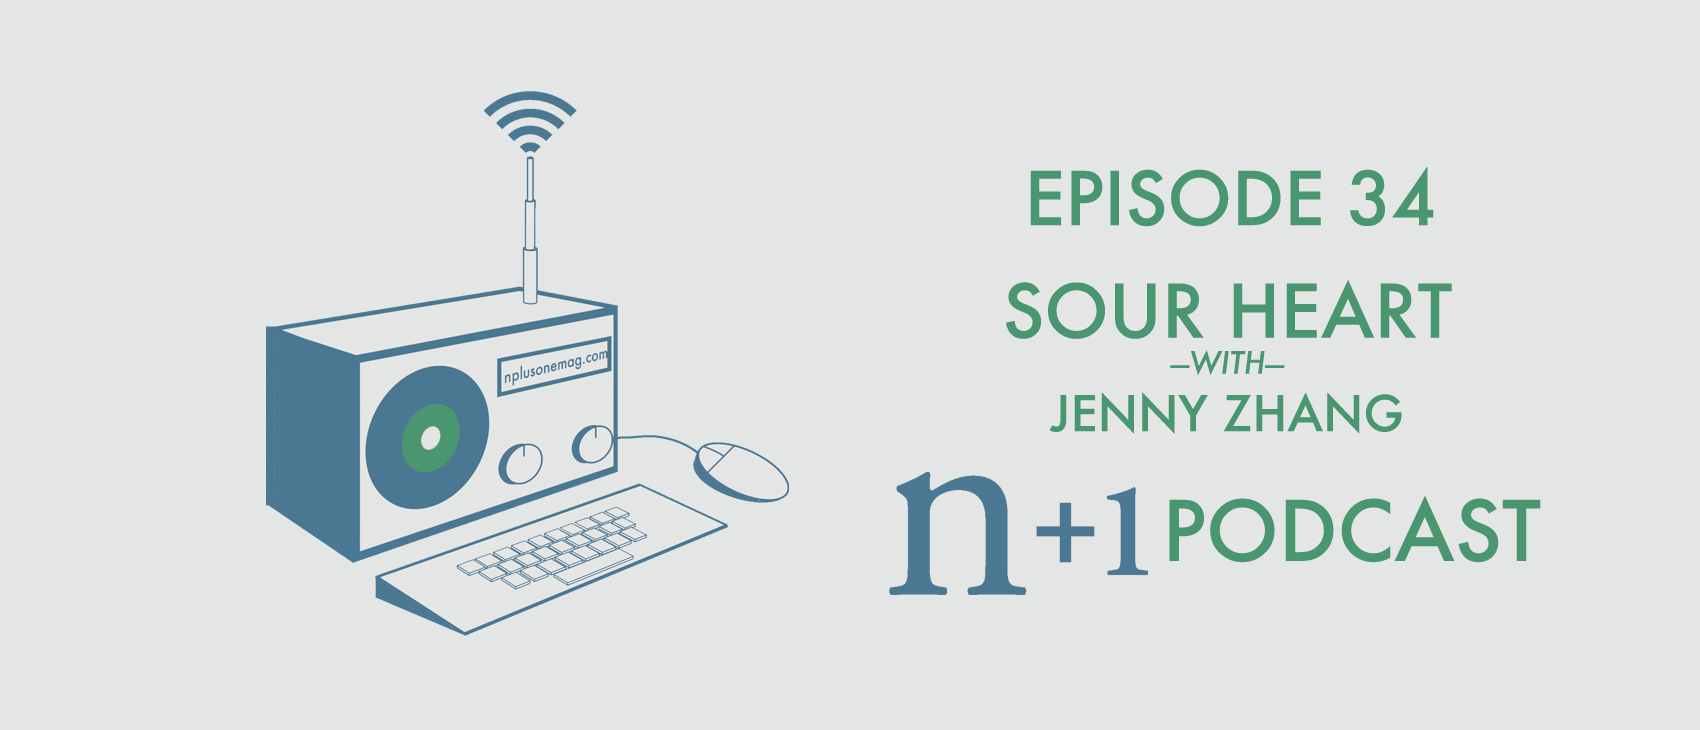 Episode 34: Sour Heart